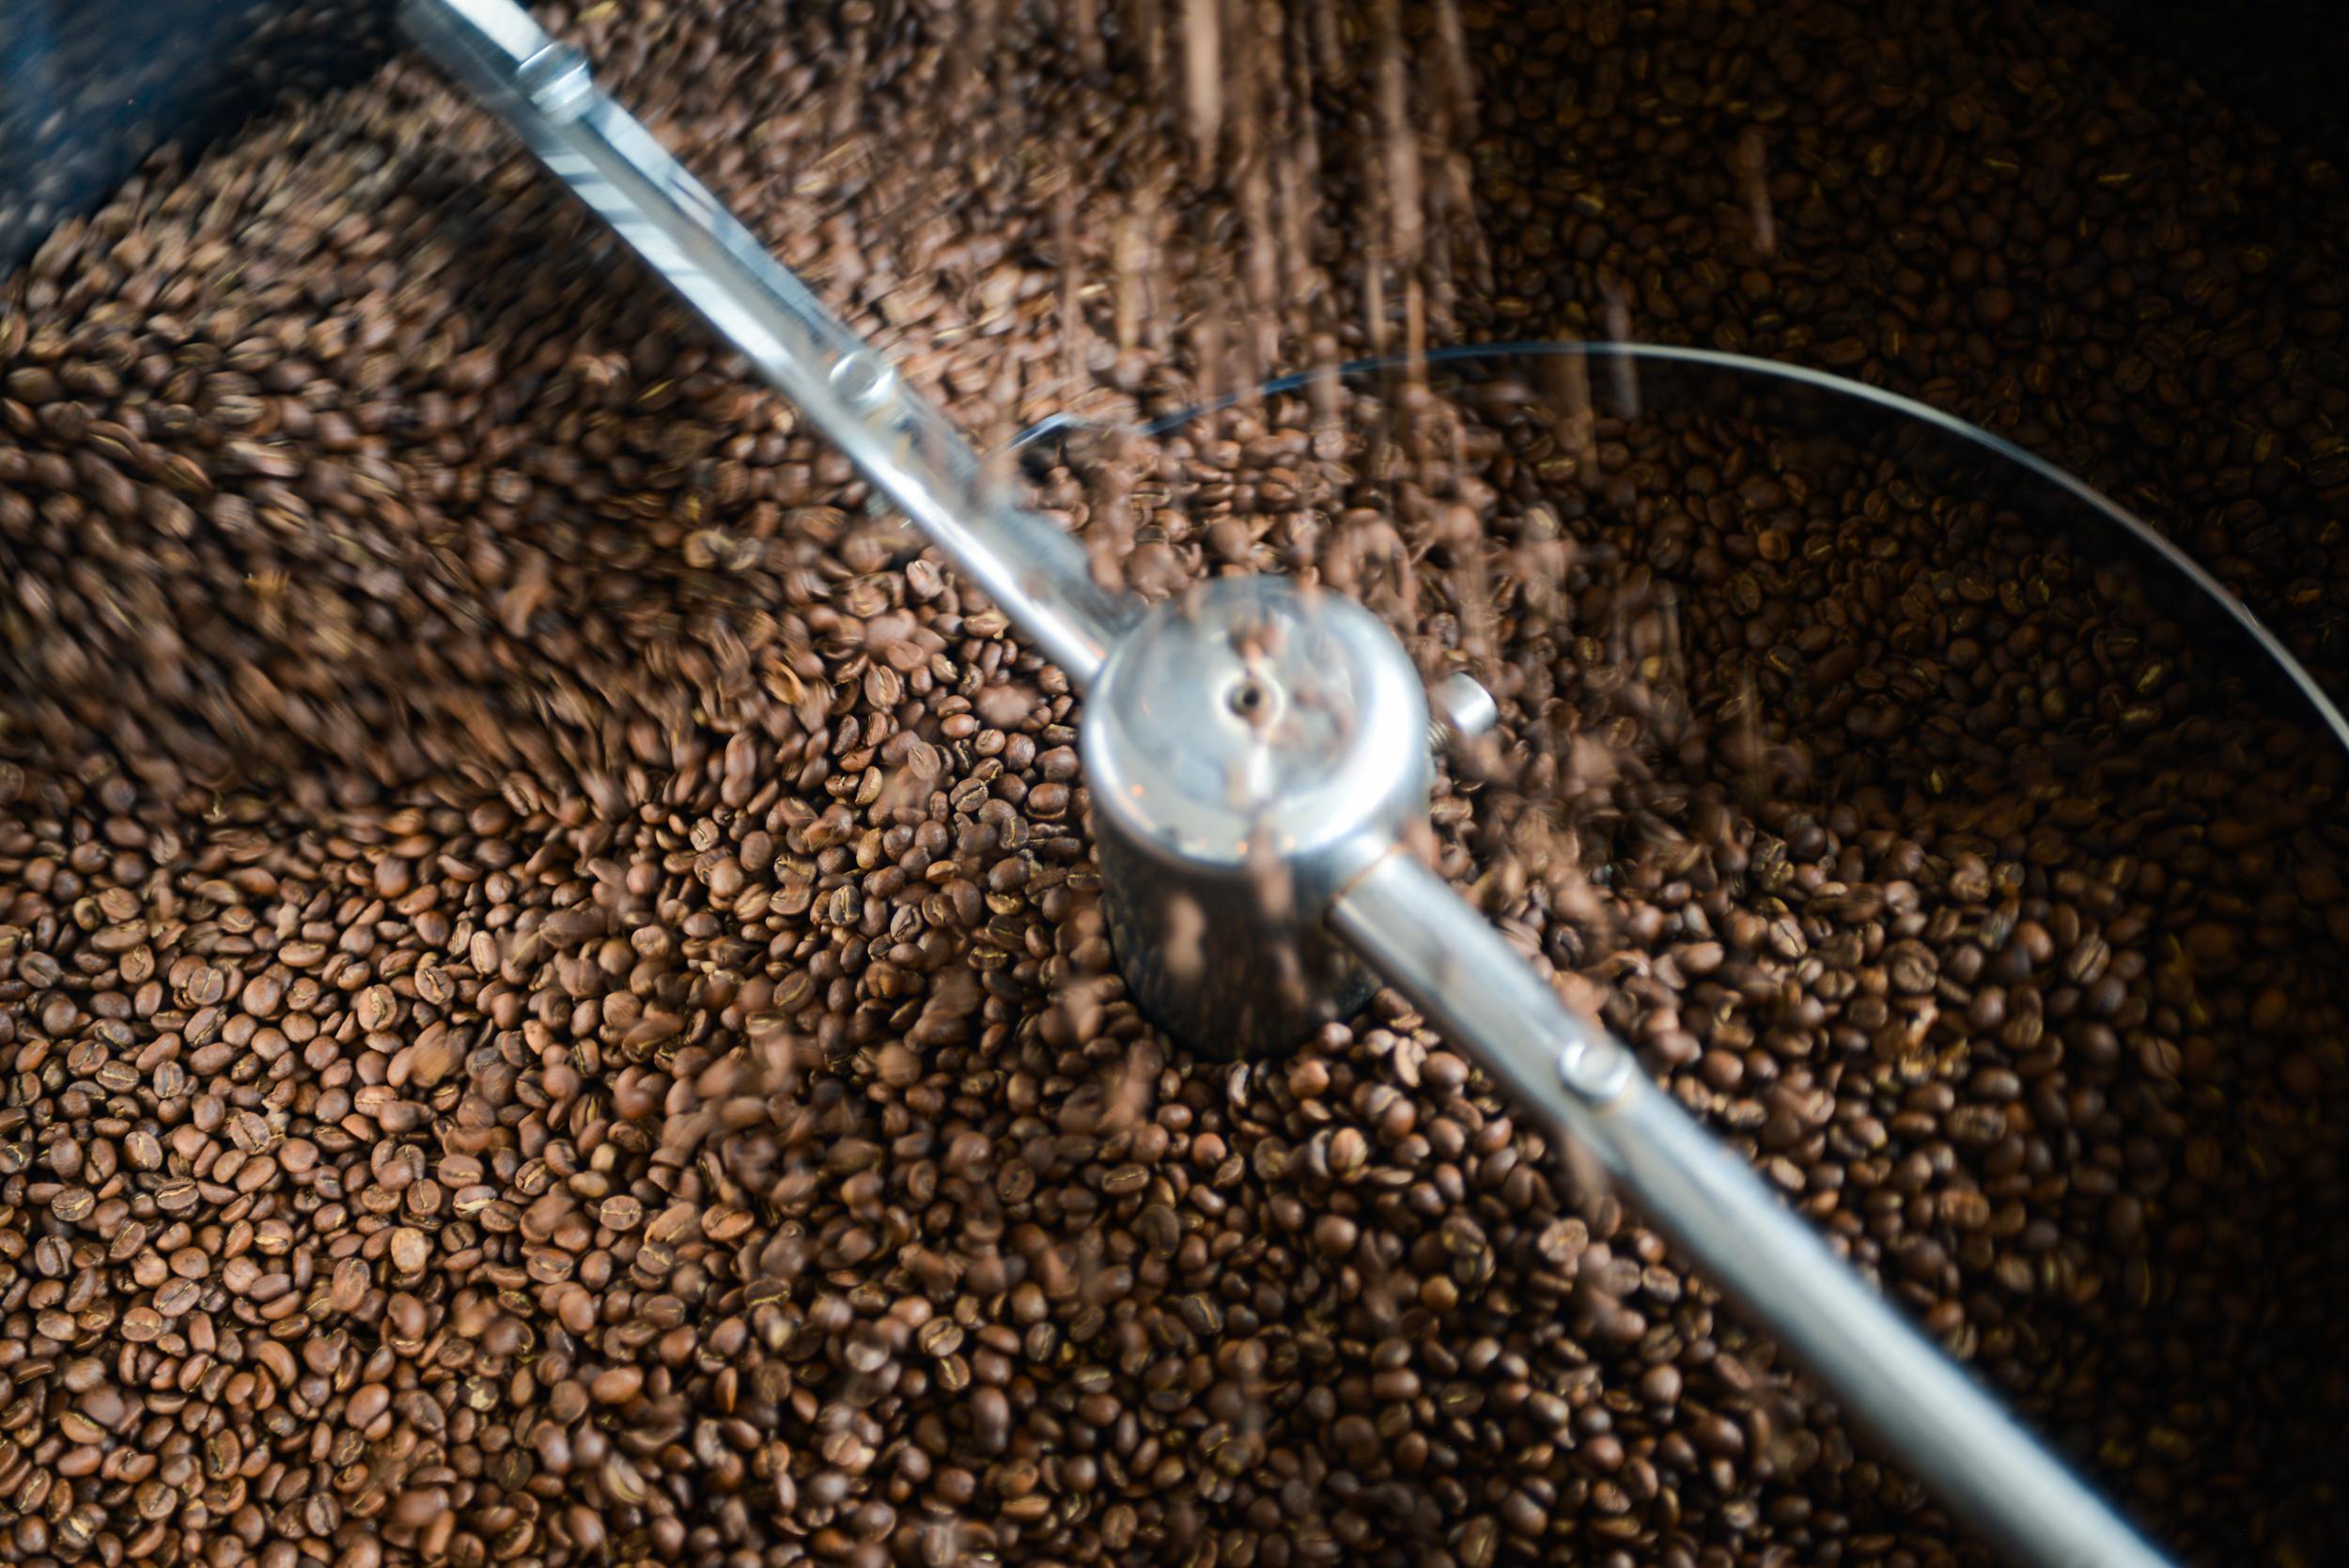 Locally Roasted & Ground Coffee! 8 ounces